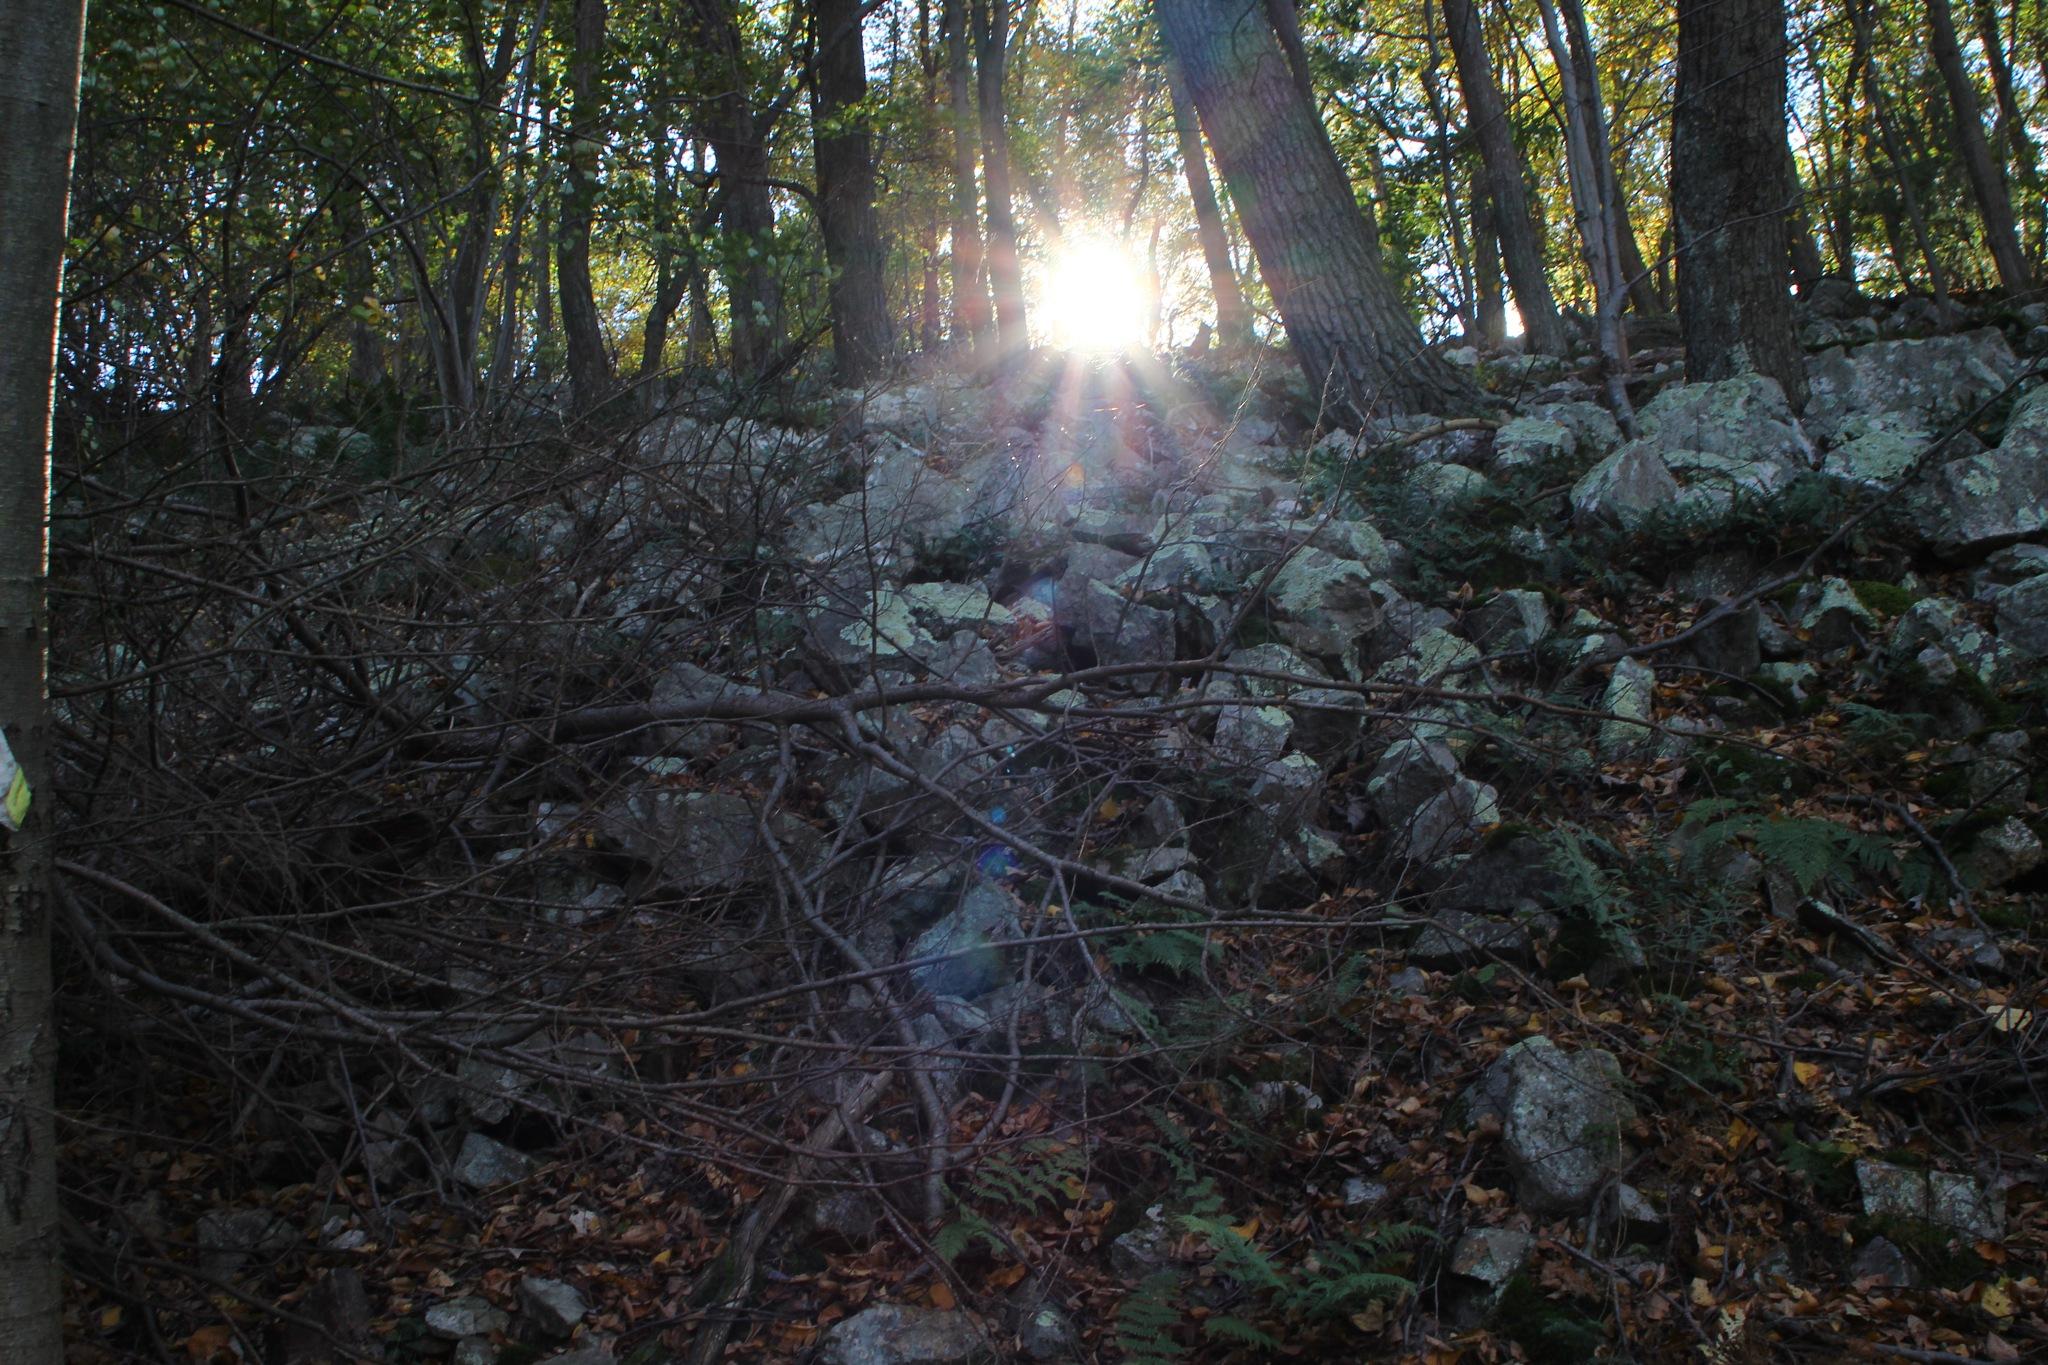 sun peeking thru the trees by Jim